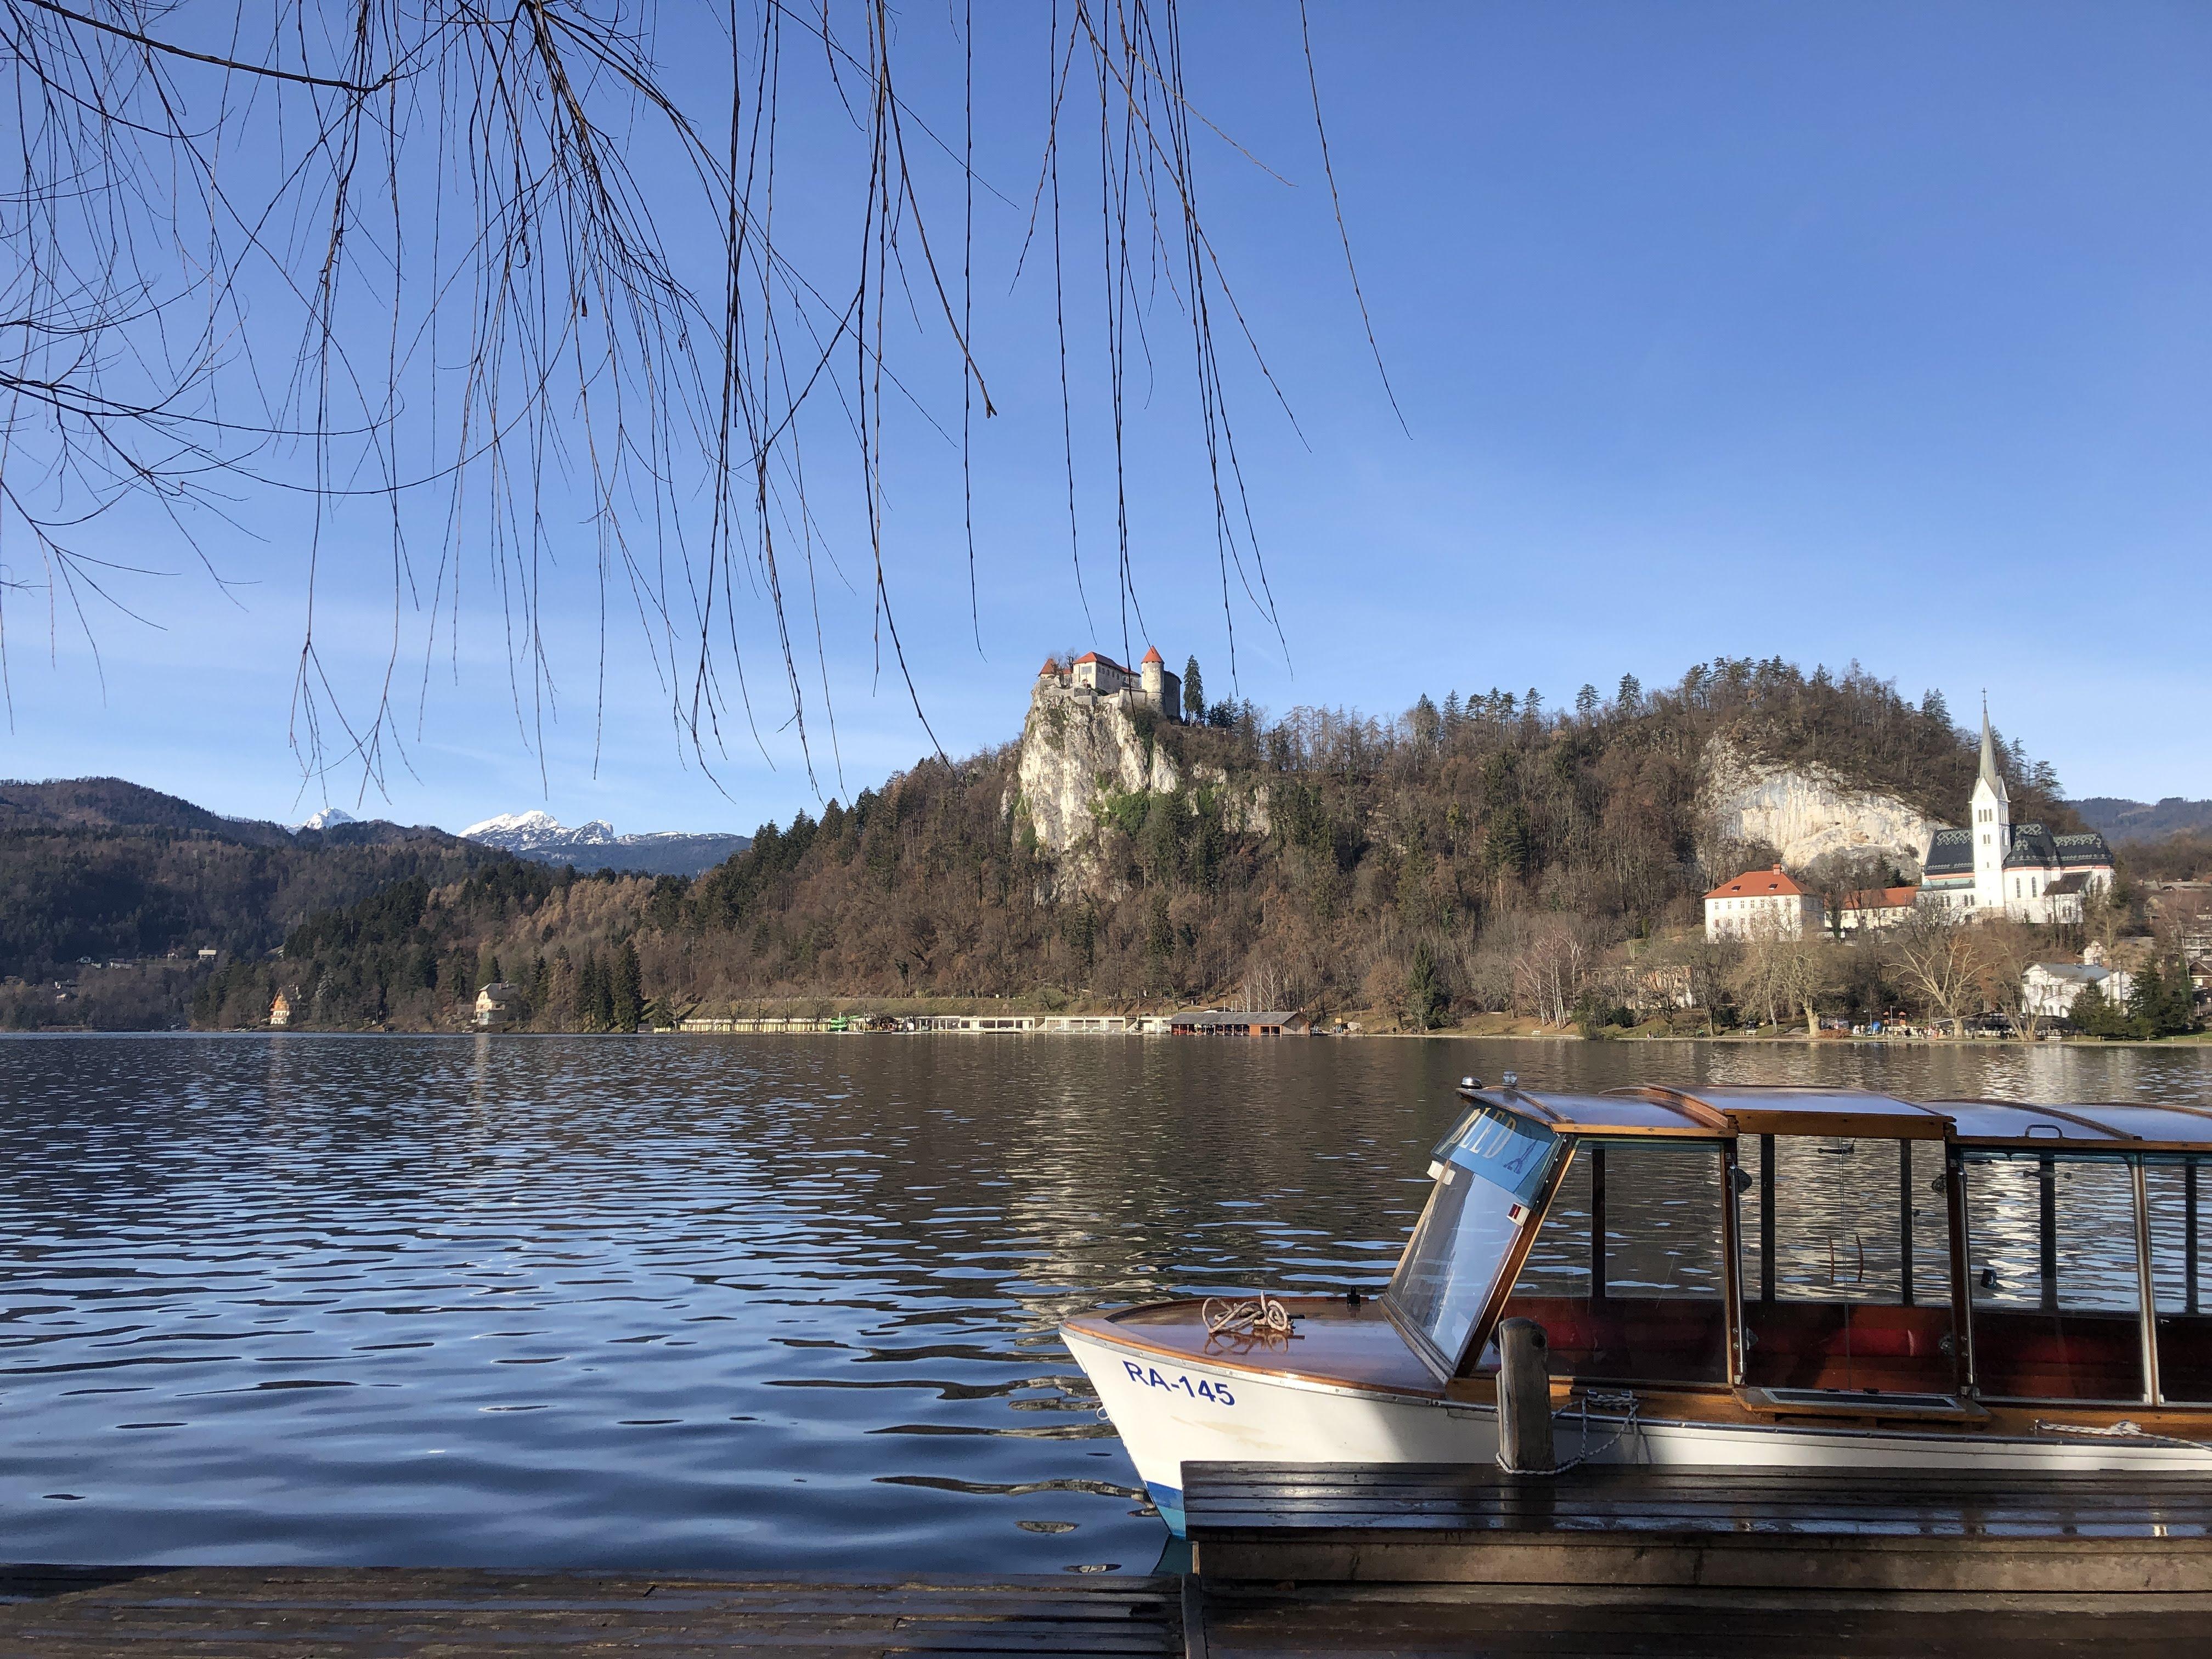 Bred, Σλοβενία